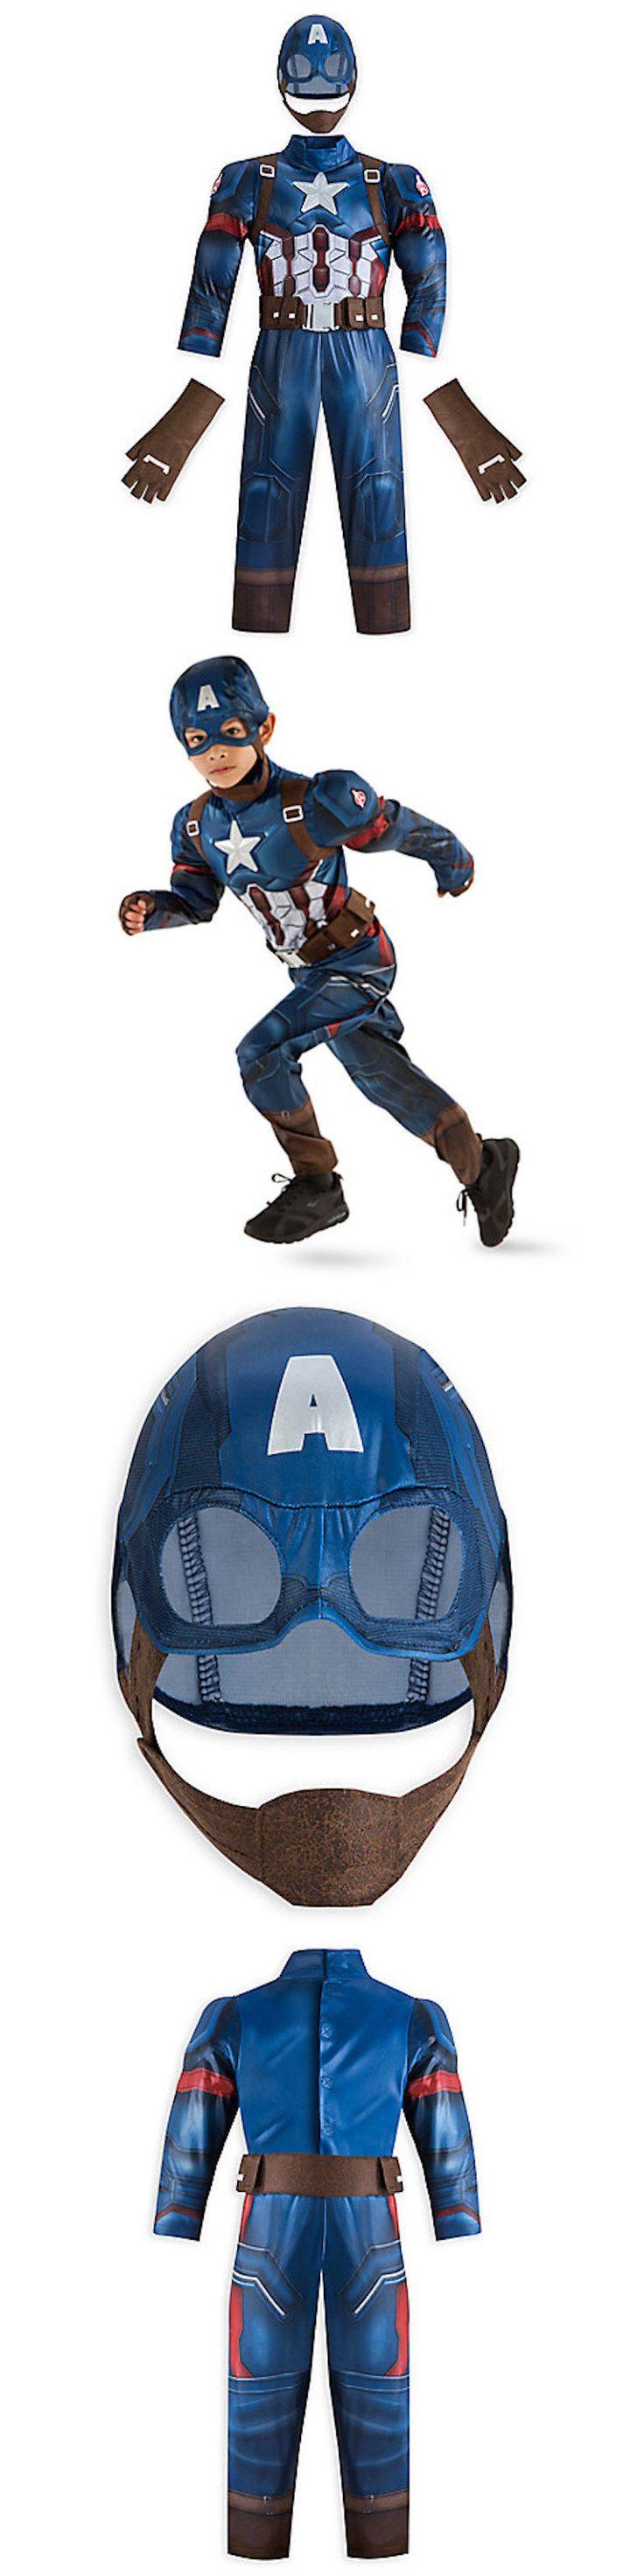 Kids Costumes: Disney Marvel Avenger Captain America Civil War Kids Costume Comic Con Boys 9/10 BUY IT NOW ONLY: $45.0